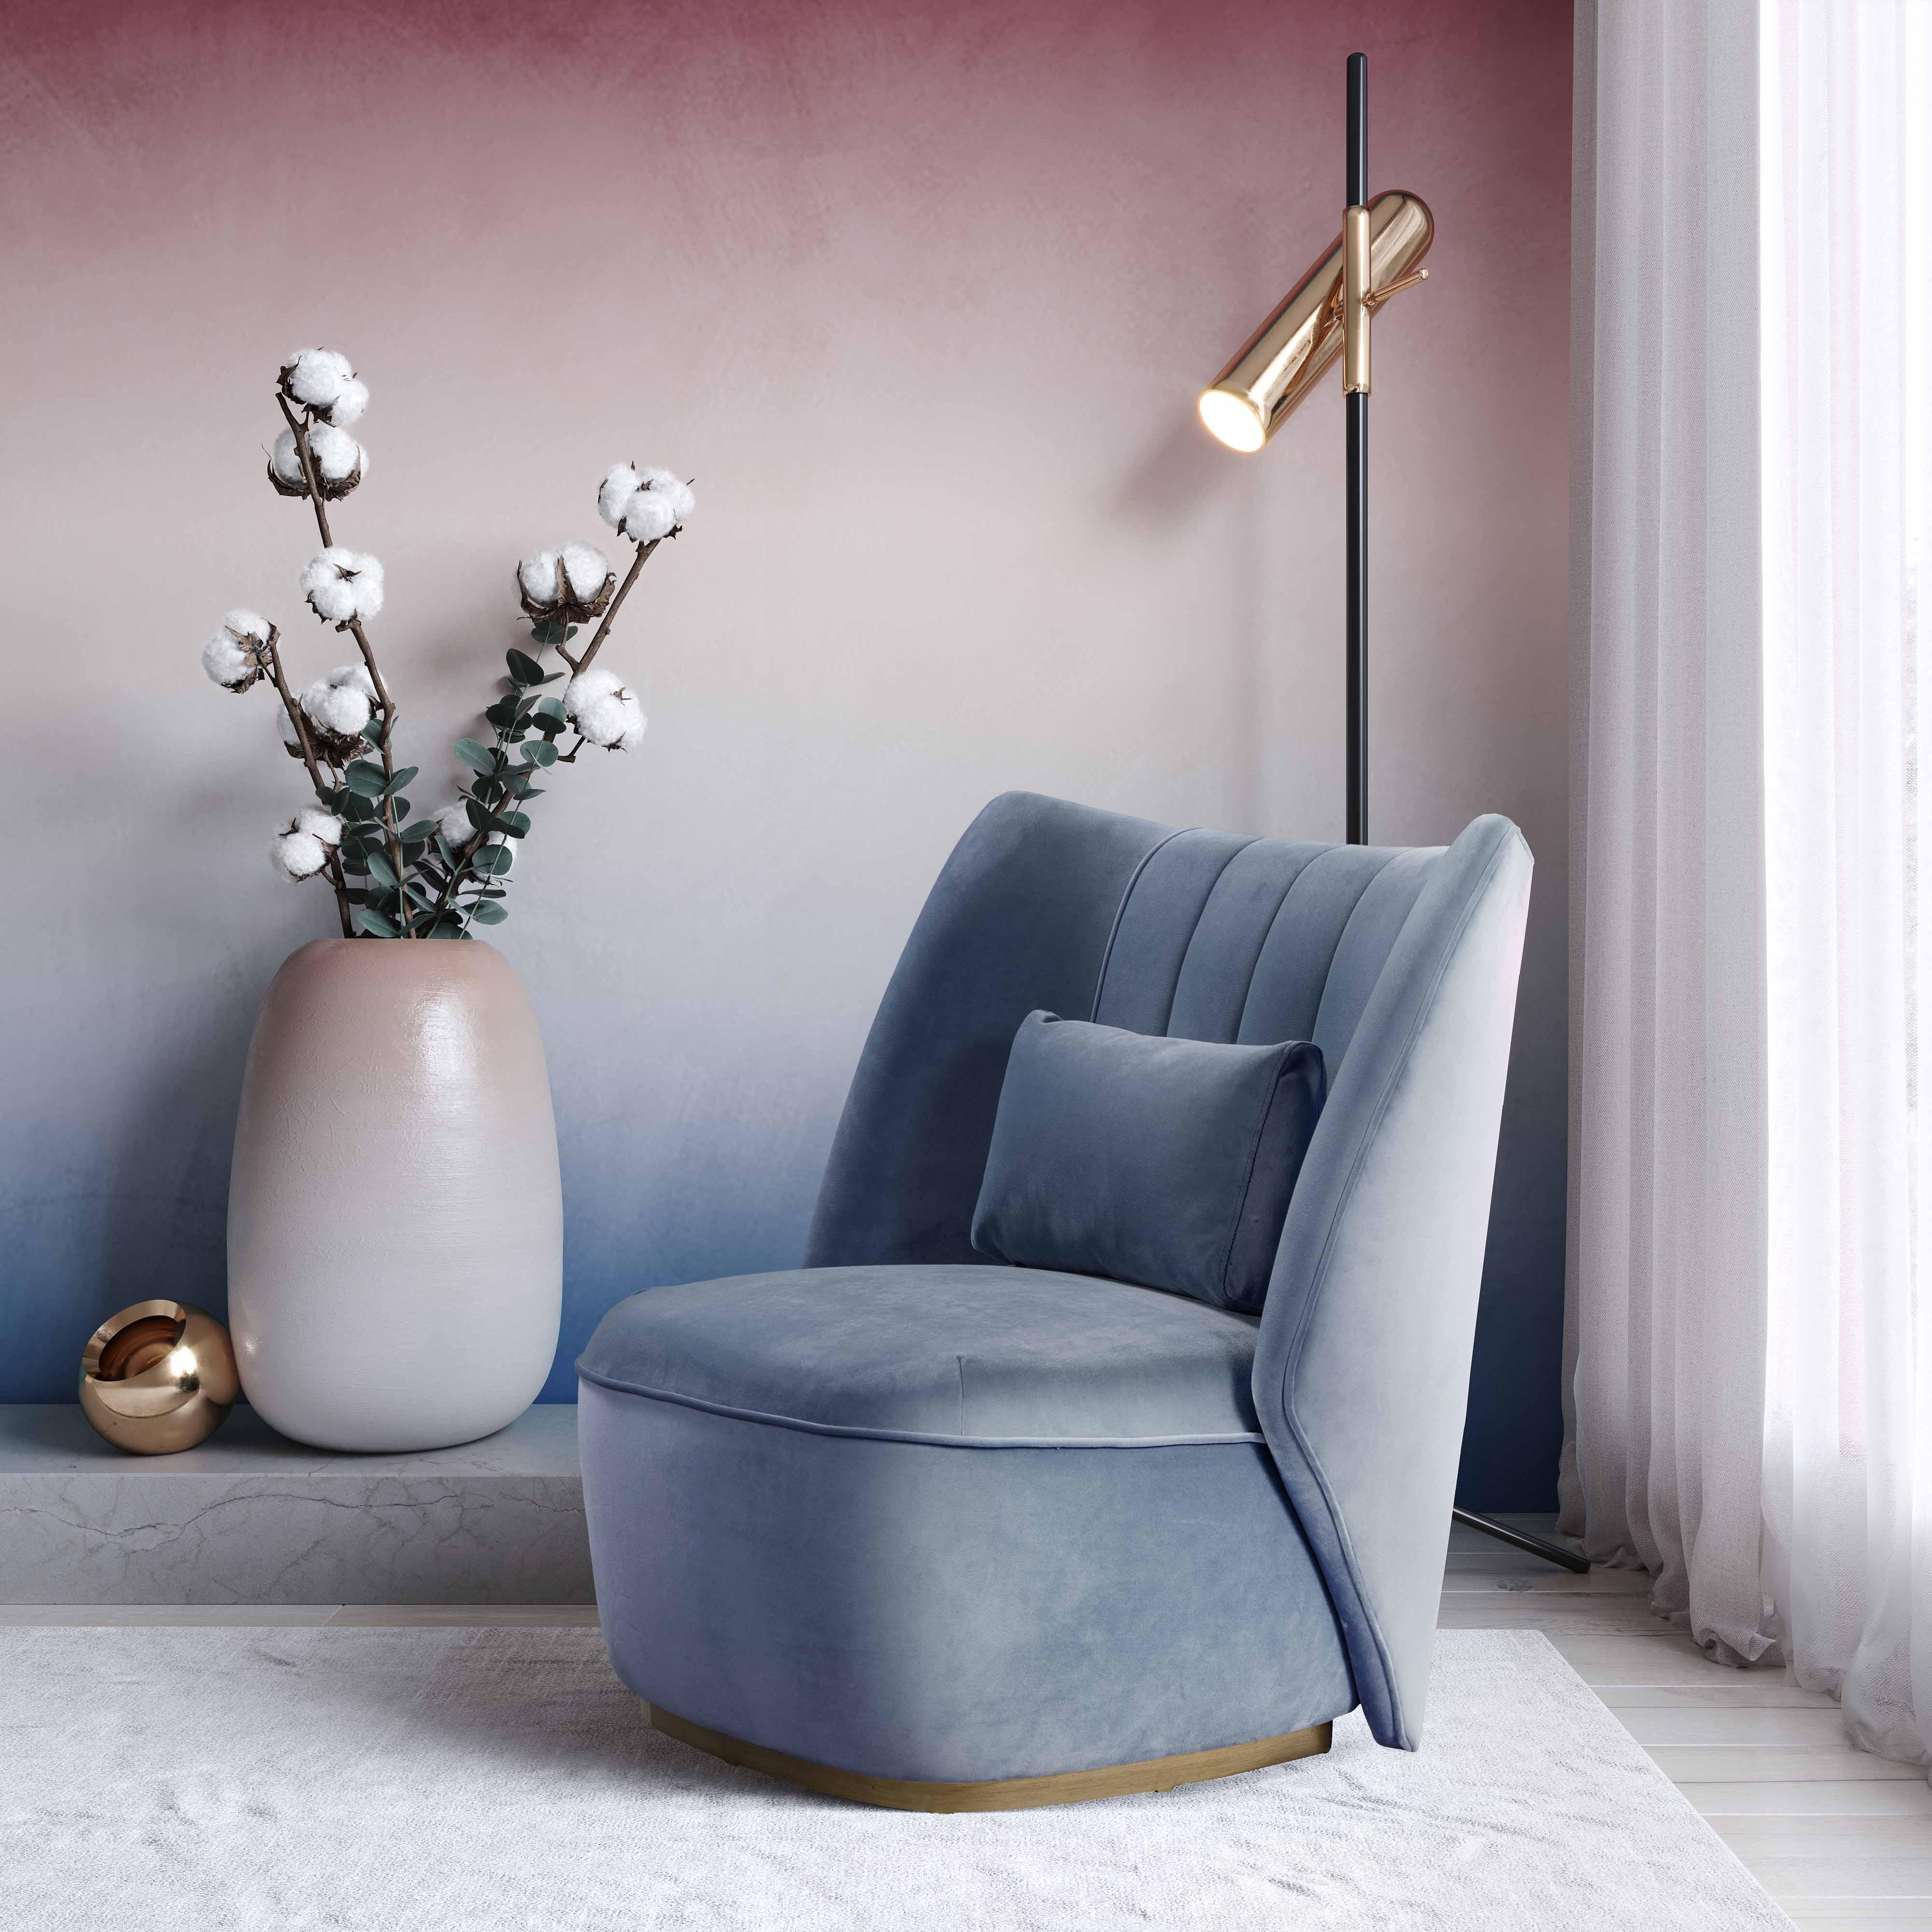 image of Reiko Cascadia Blue Lounge Chair with sku:TOV-S44029